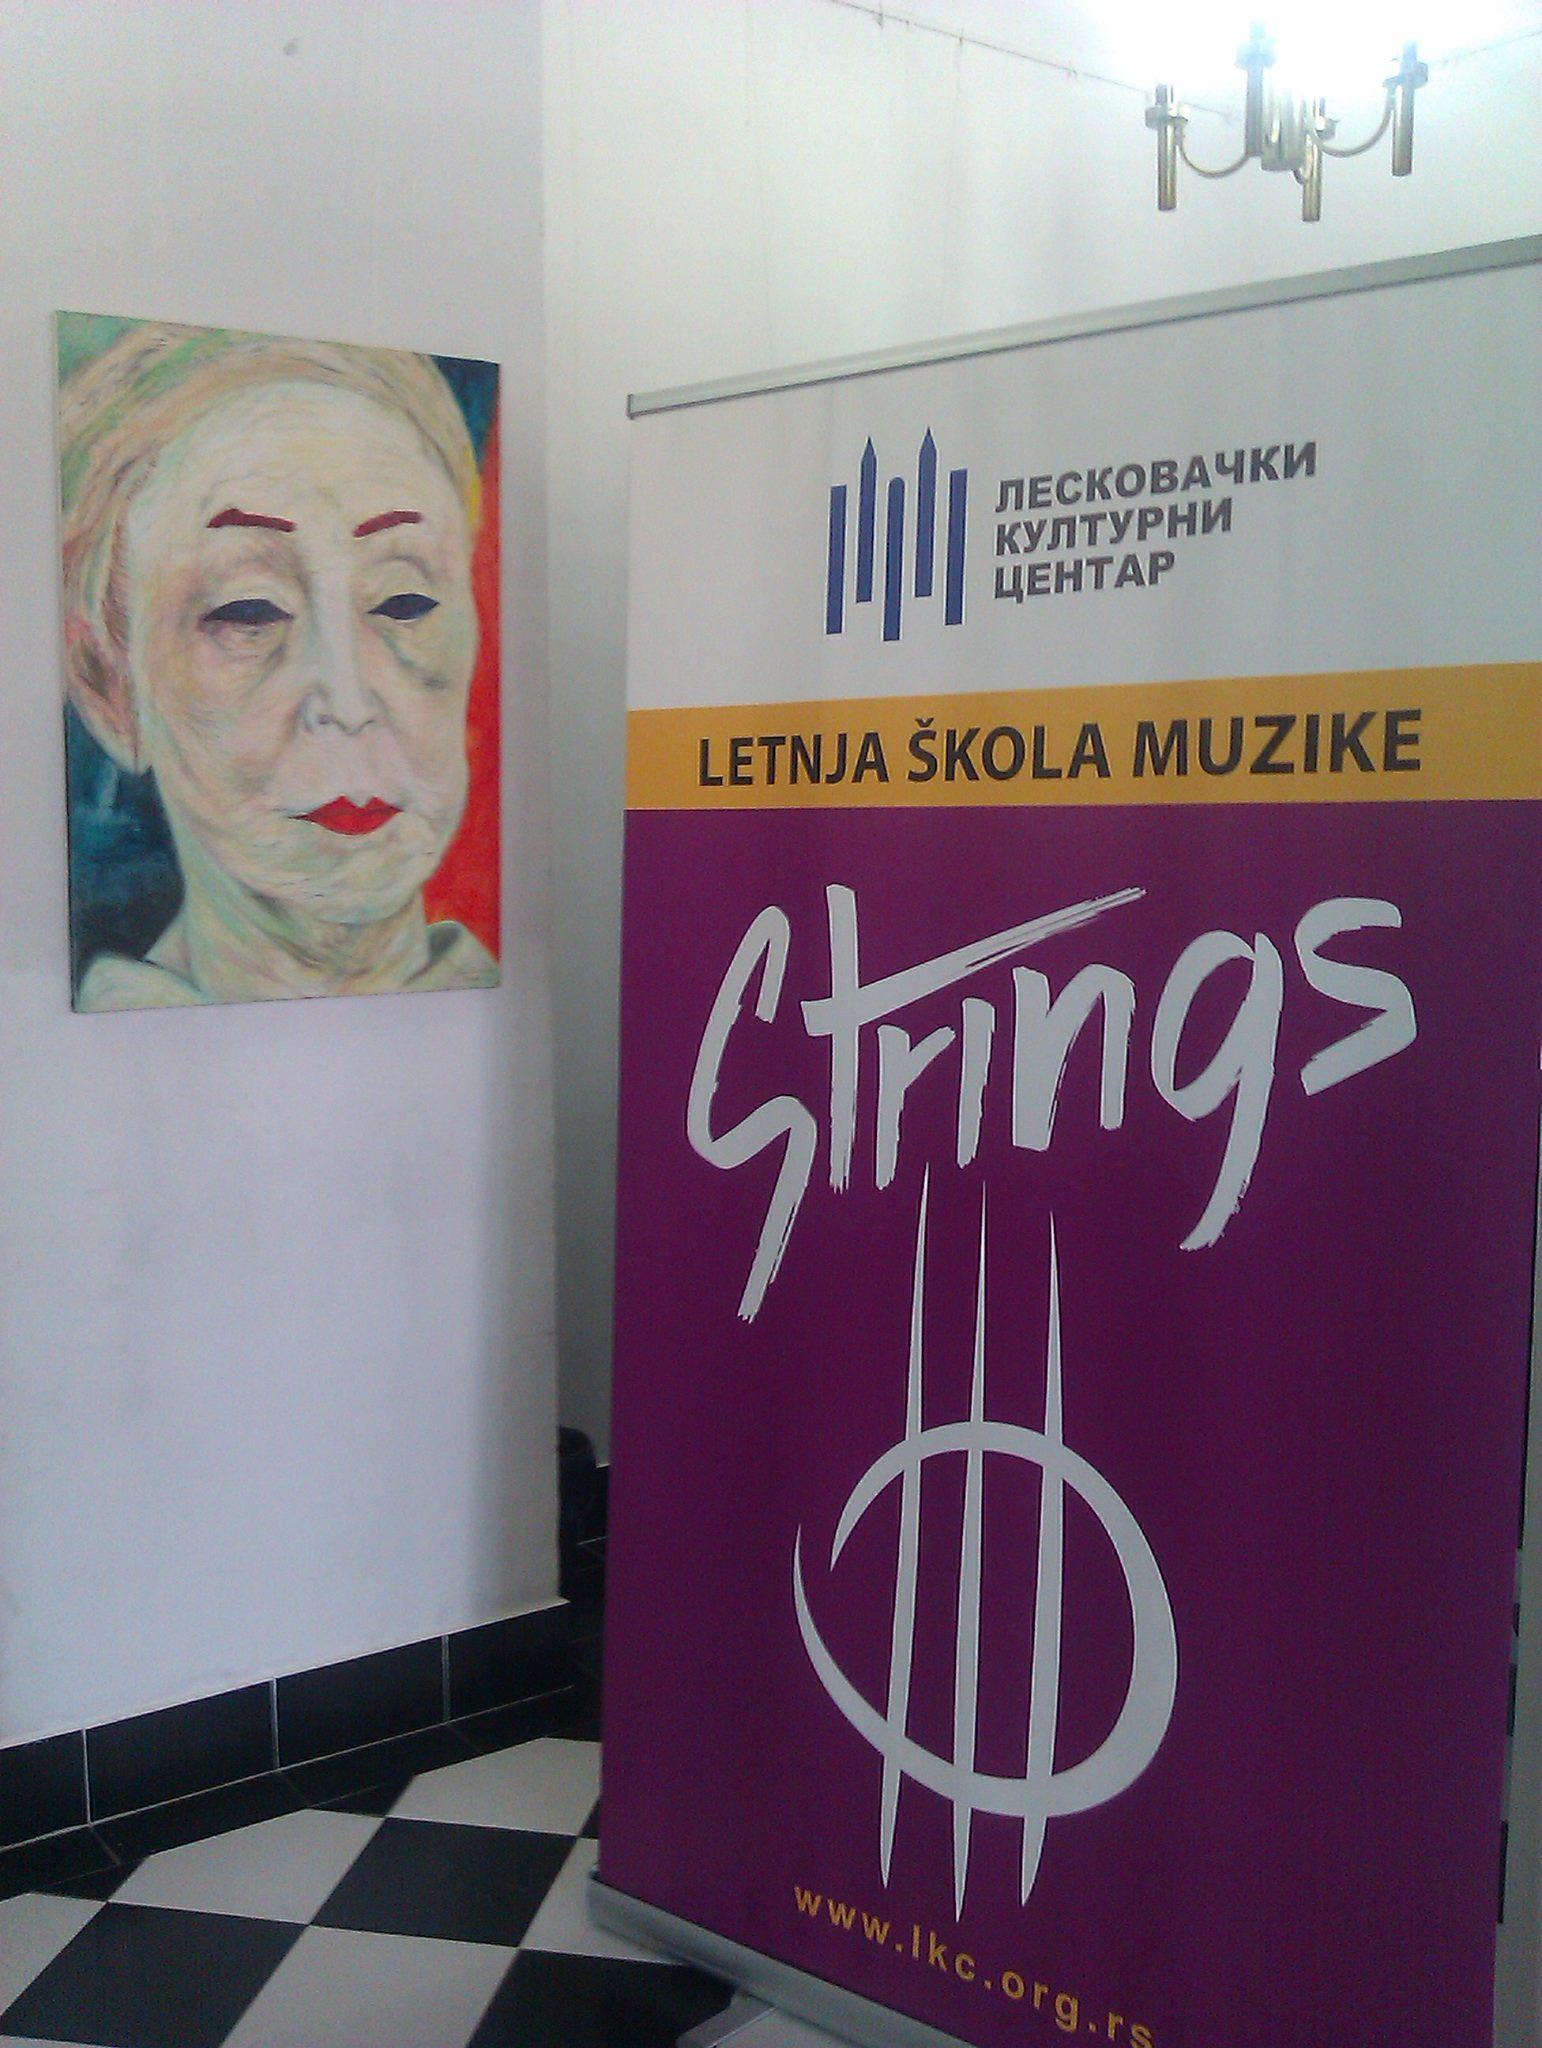 corul_sound_leskovac_serbia_2014_9